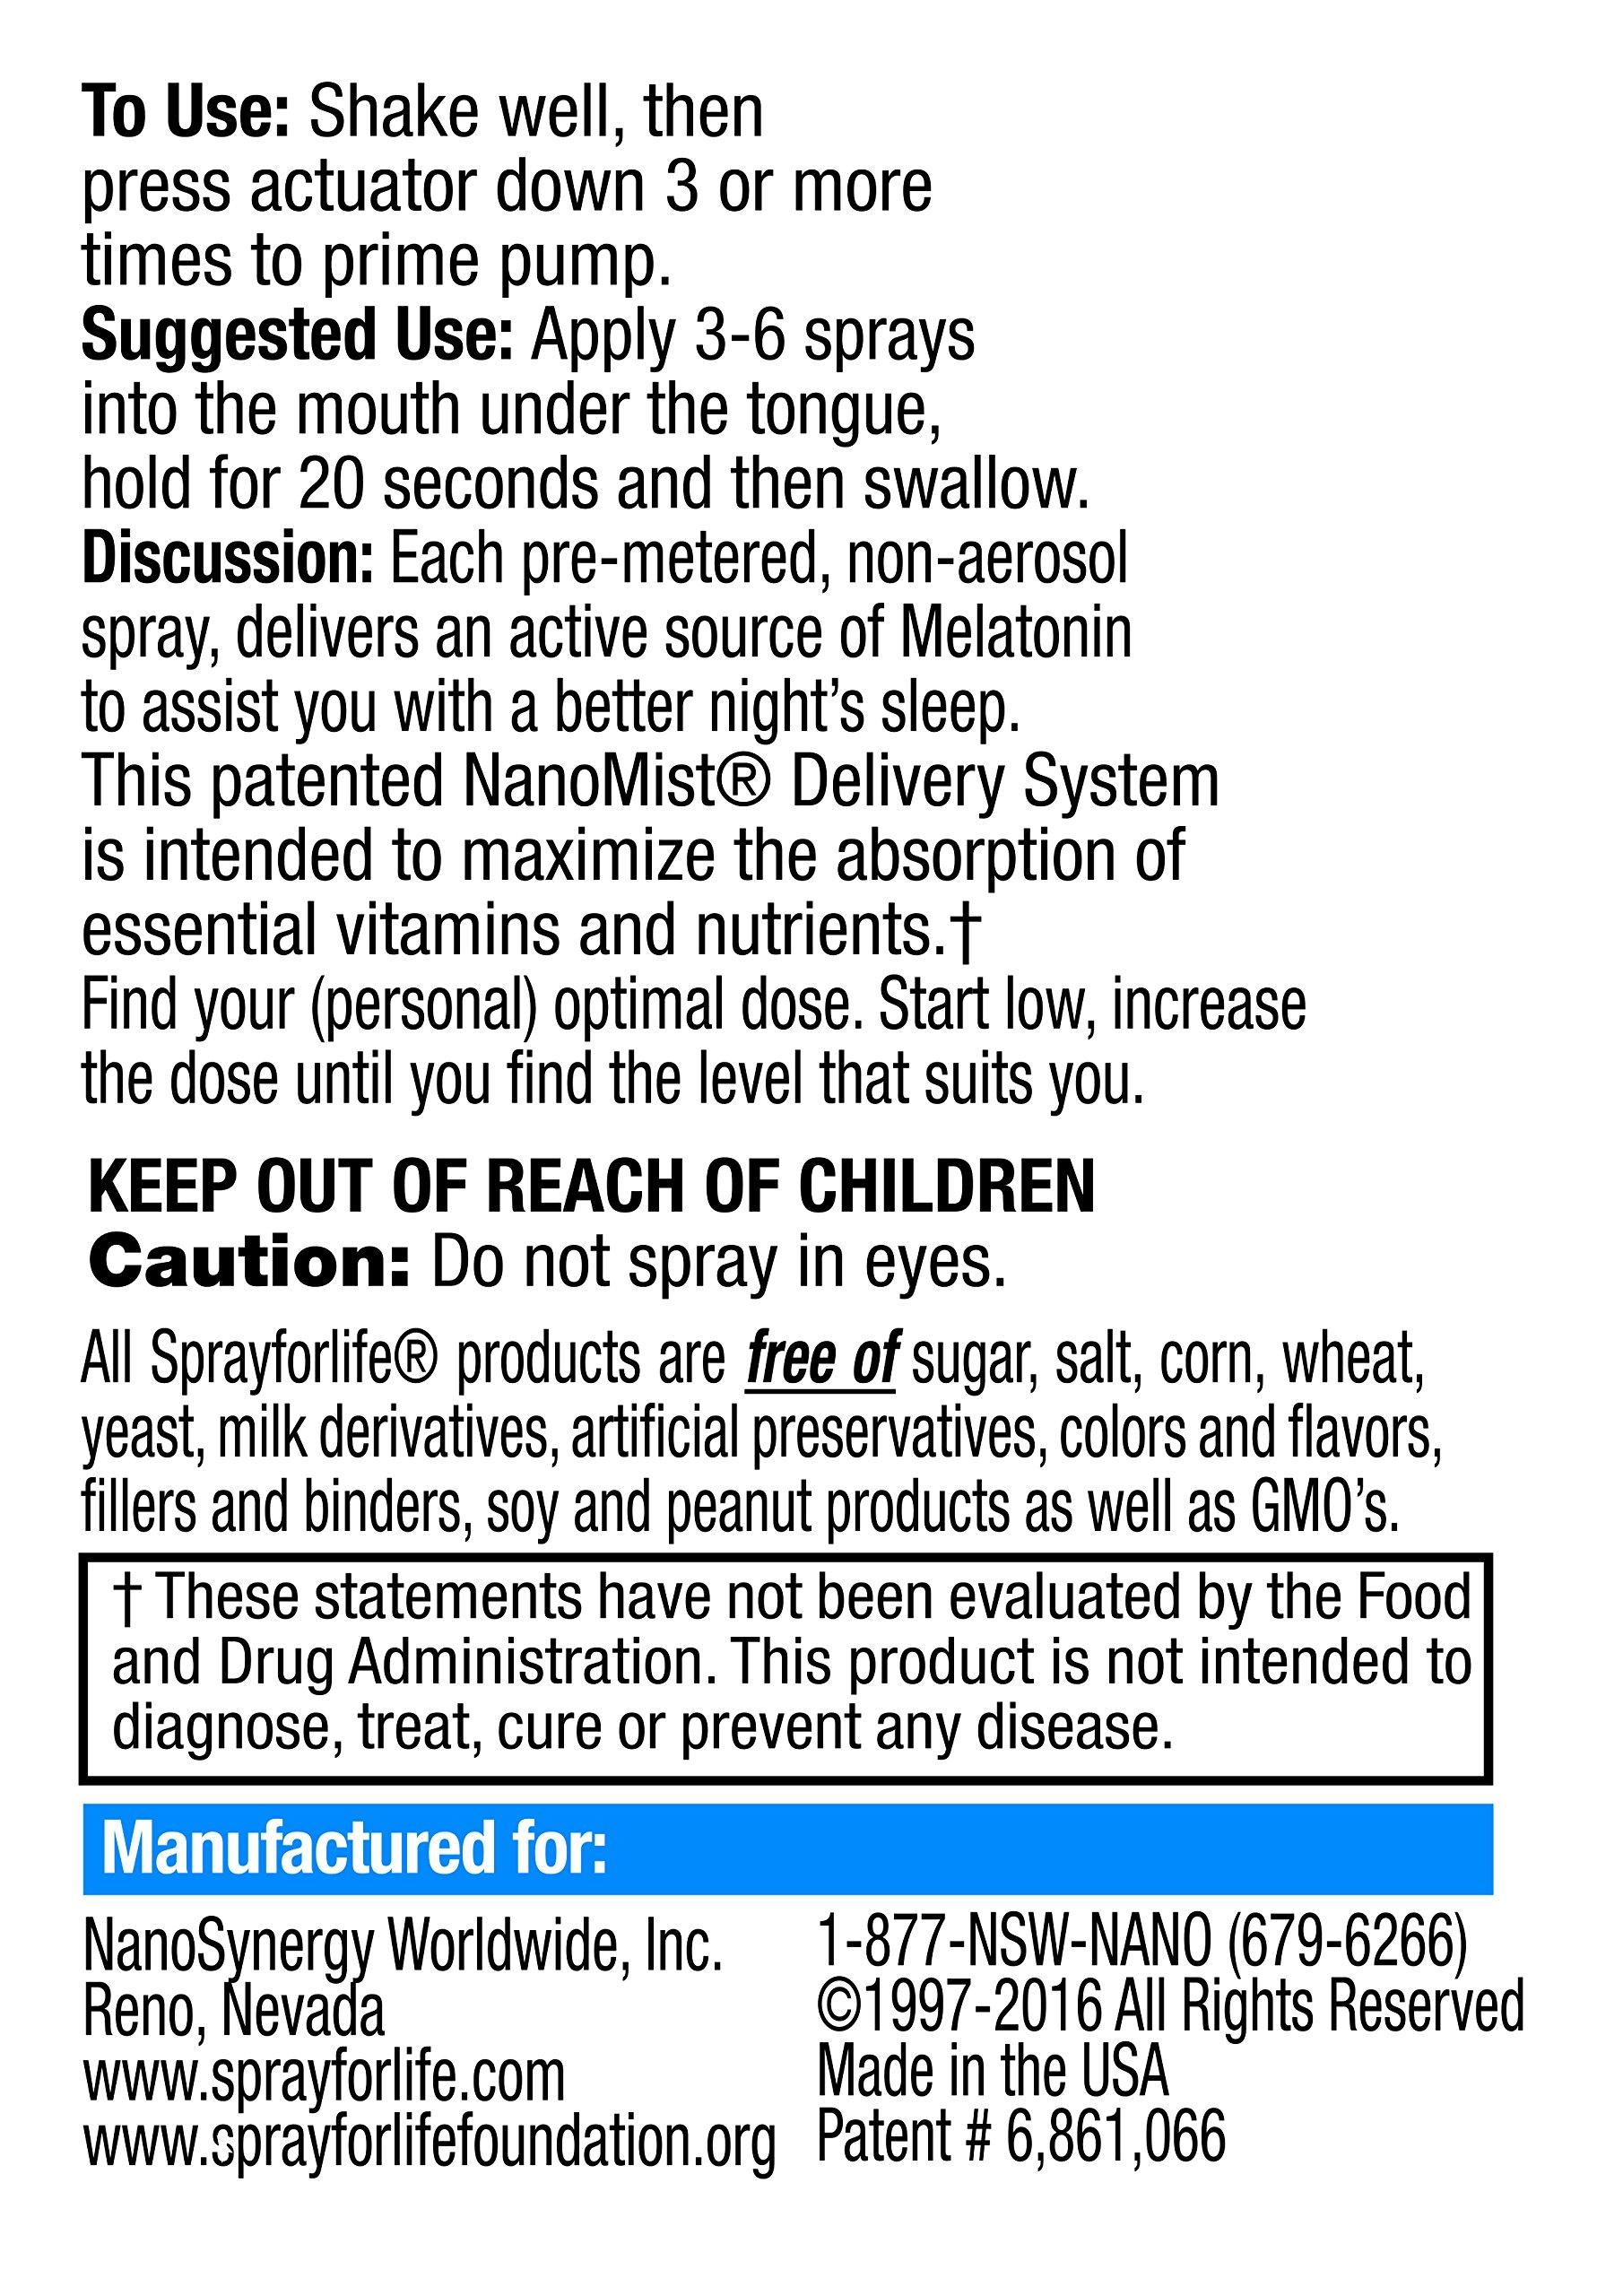 Spray for Life Melatonin Spray with Nanotechnology for Improved Sleep Guaranteed 1oz - Spearmint & Lemon - 30 Day Supply by Spray For Life (Image #4)